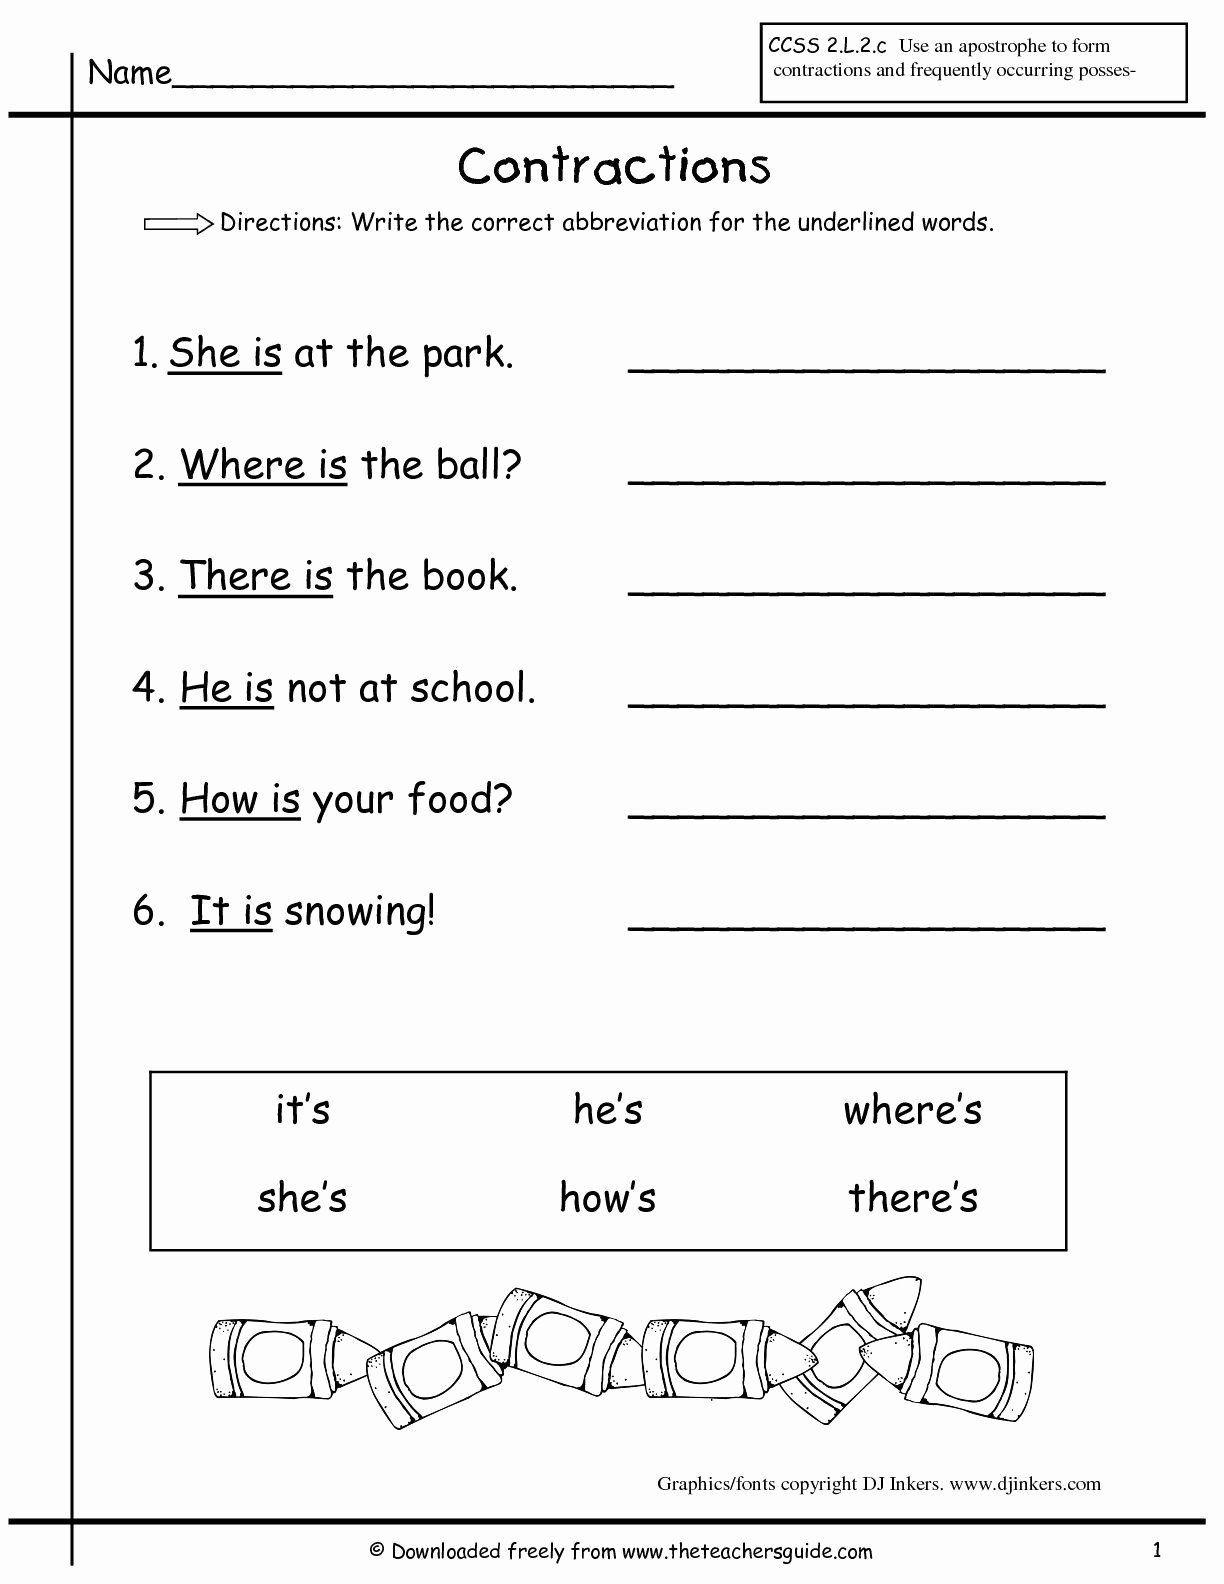 3rd Grade Science Worksheets Second Grade Science